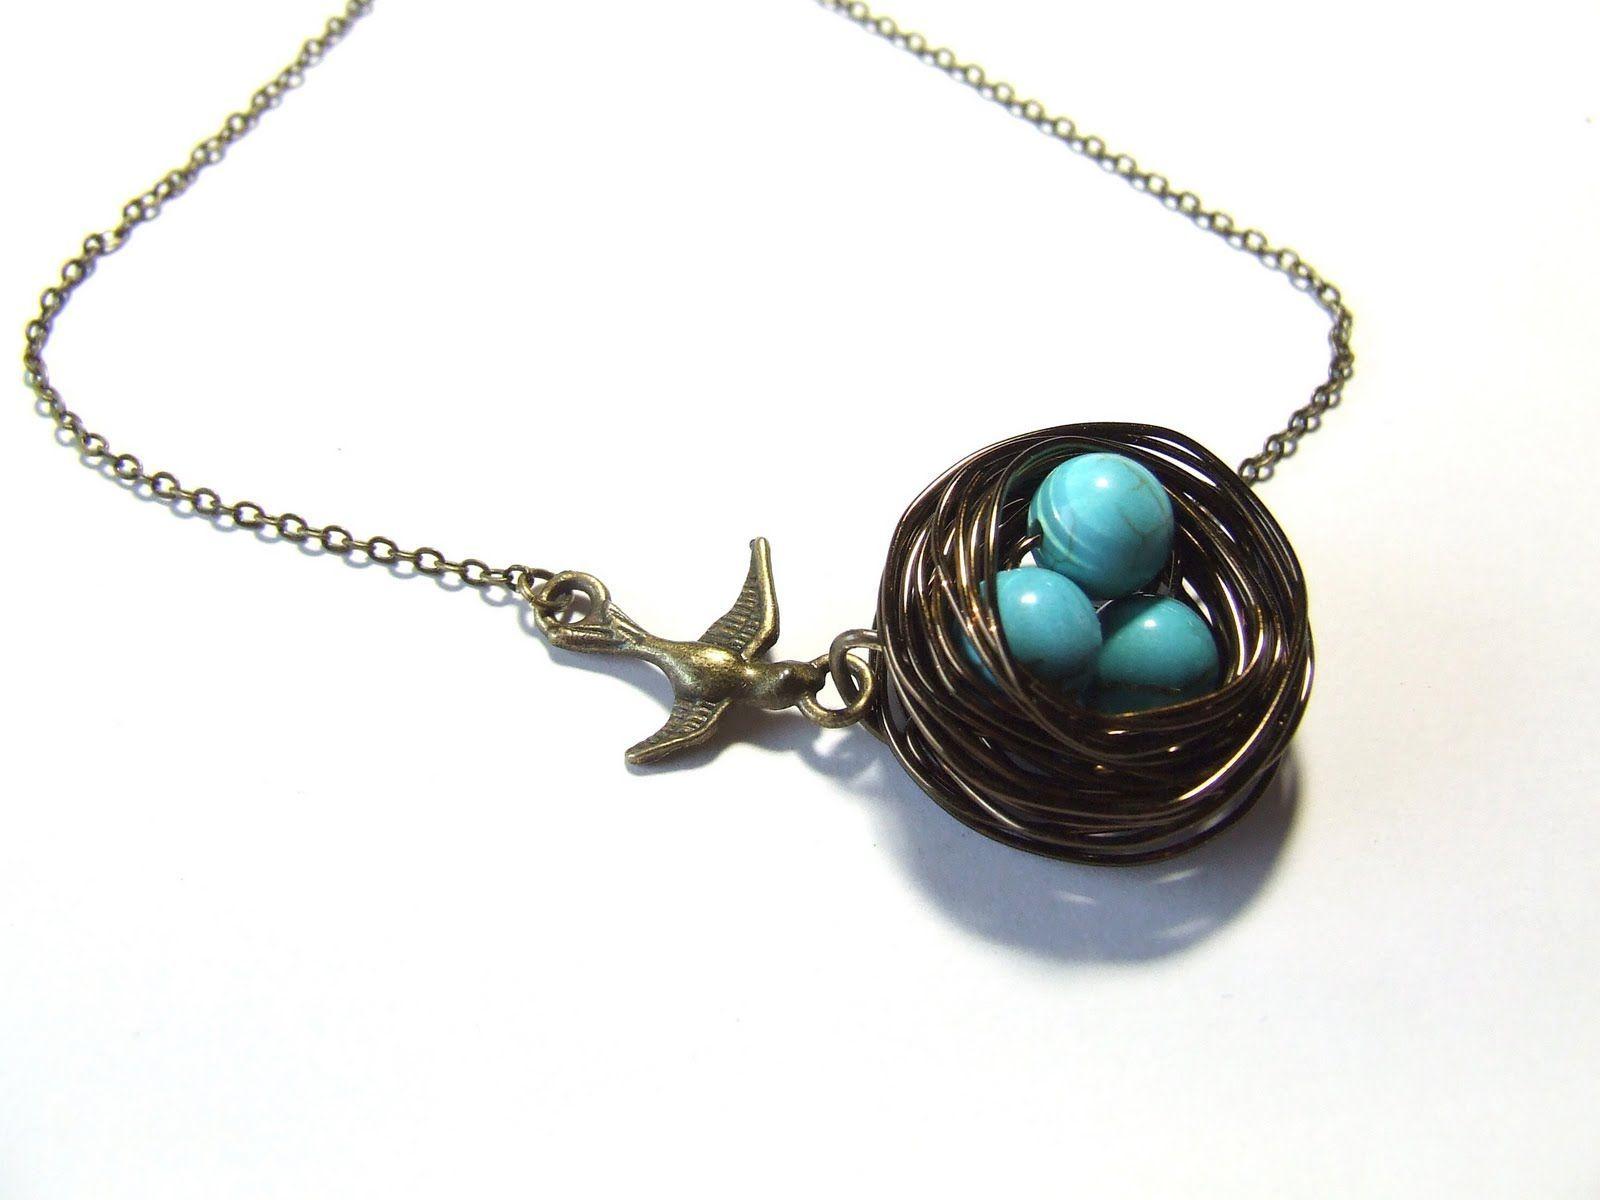 Handmade Jewelry Designs - Up  The Journey Of Handmade